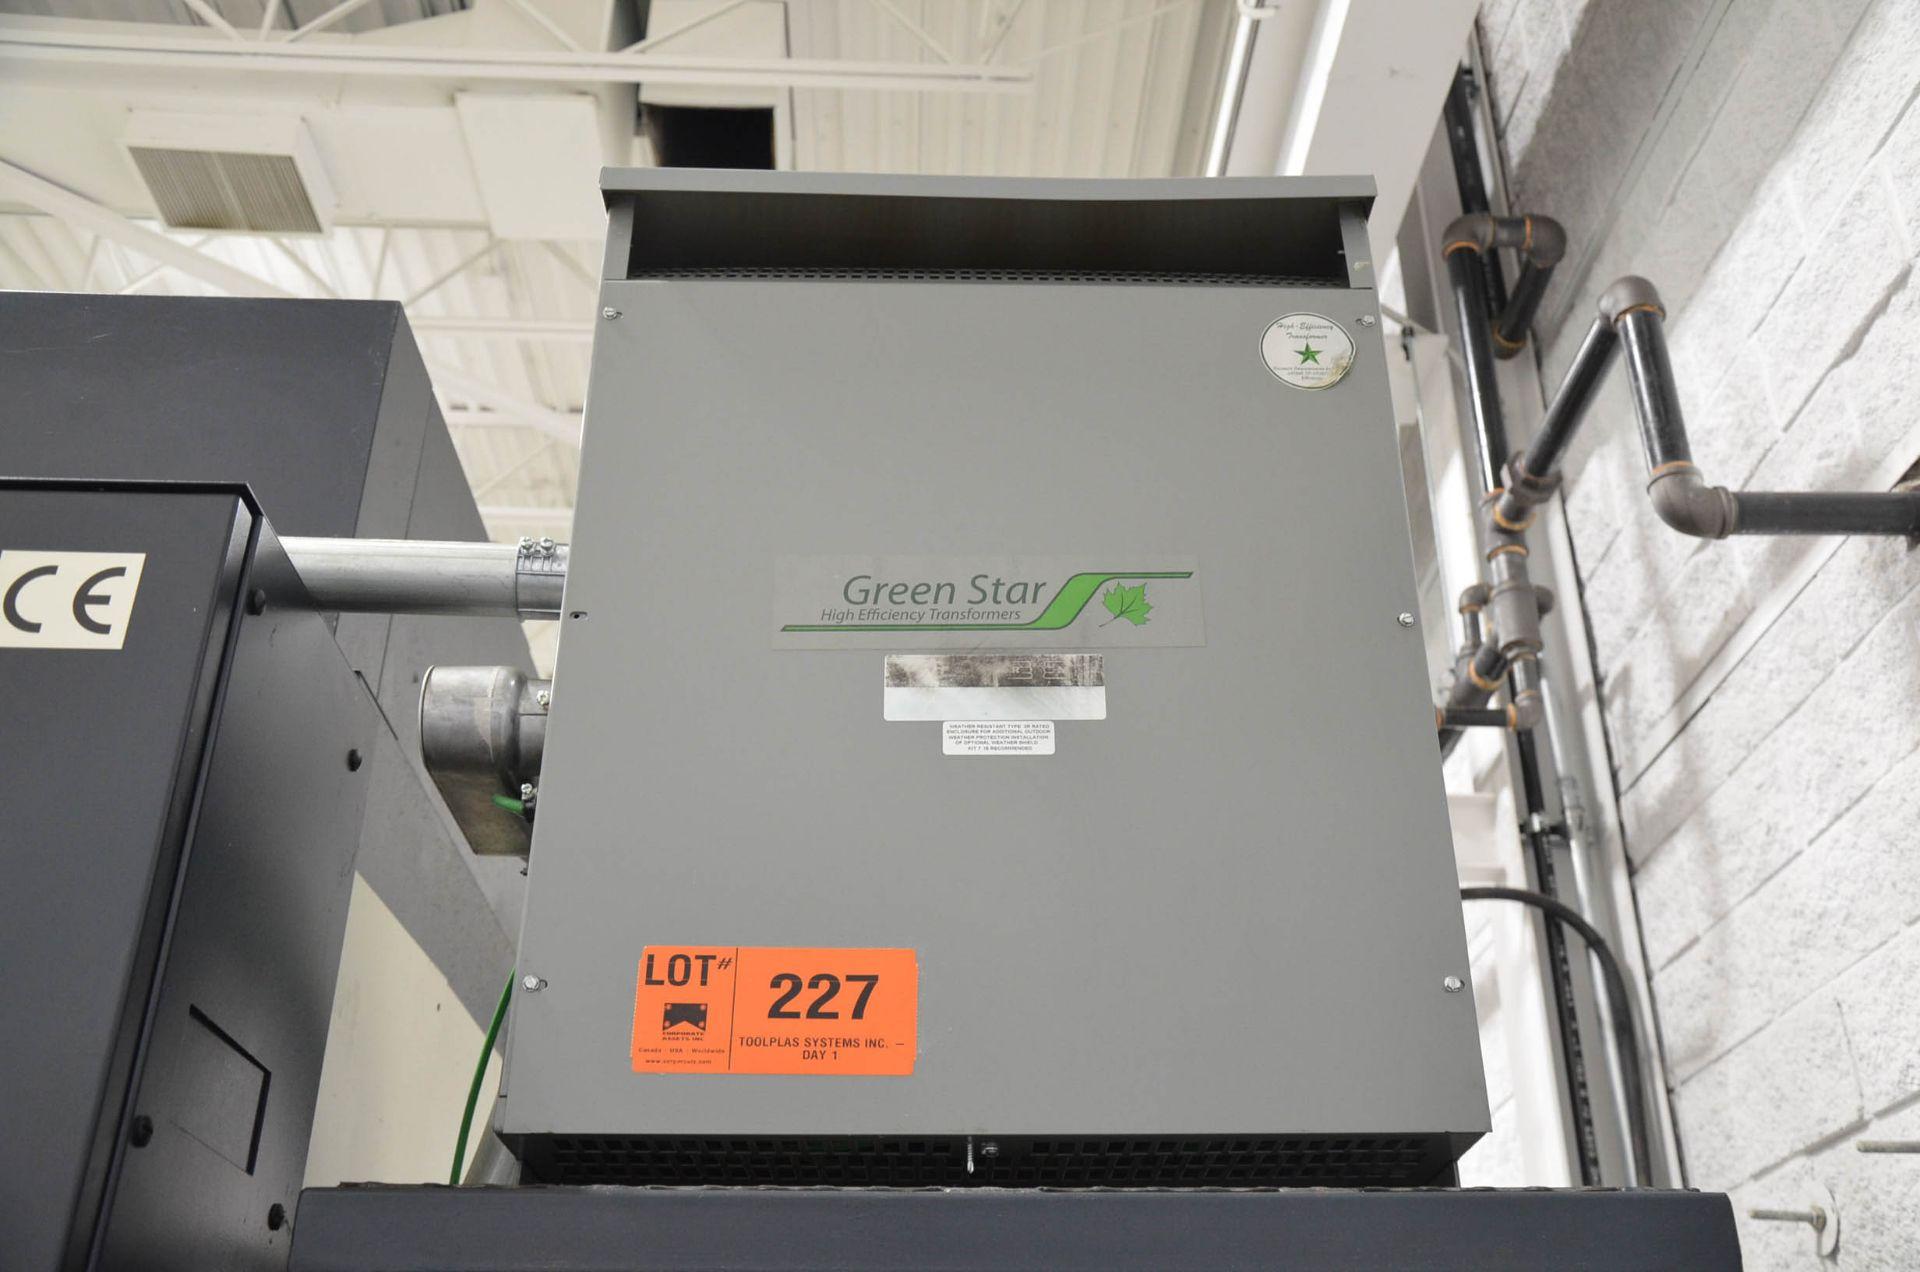 REX 75KVA/600-208-120V/3PH/60HZ TRANSFORMER (CI) [RIGGING FEES FOR LOT #227 - $50 USD PLUS